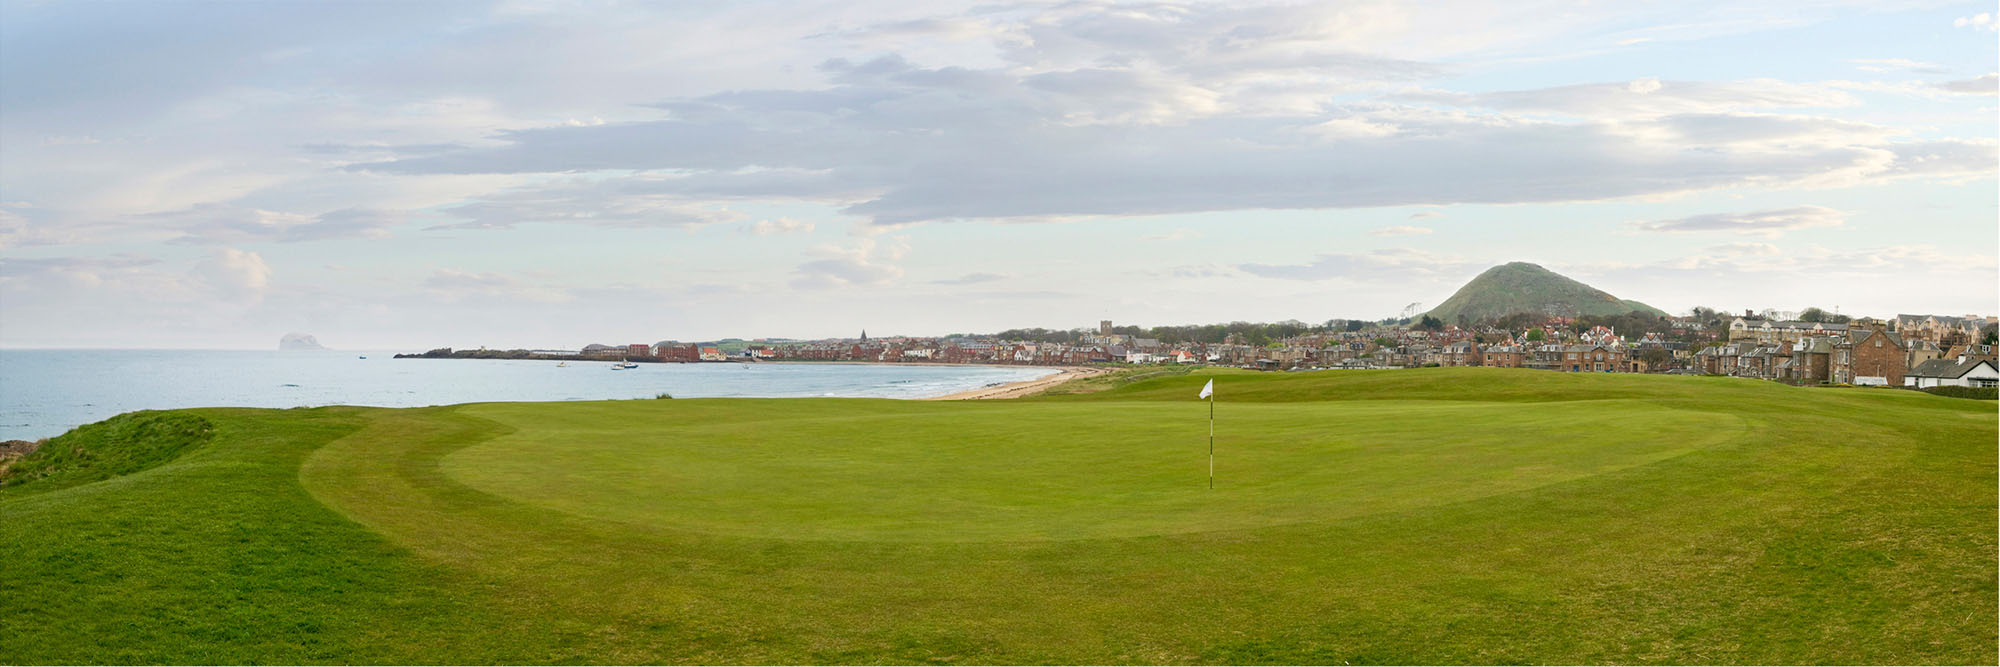 Golf Course Image - North Berwick Golf Club No. 1